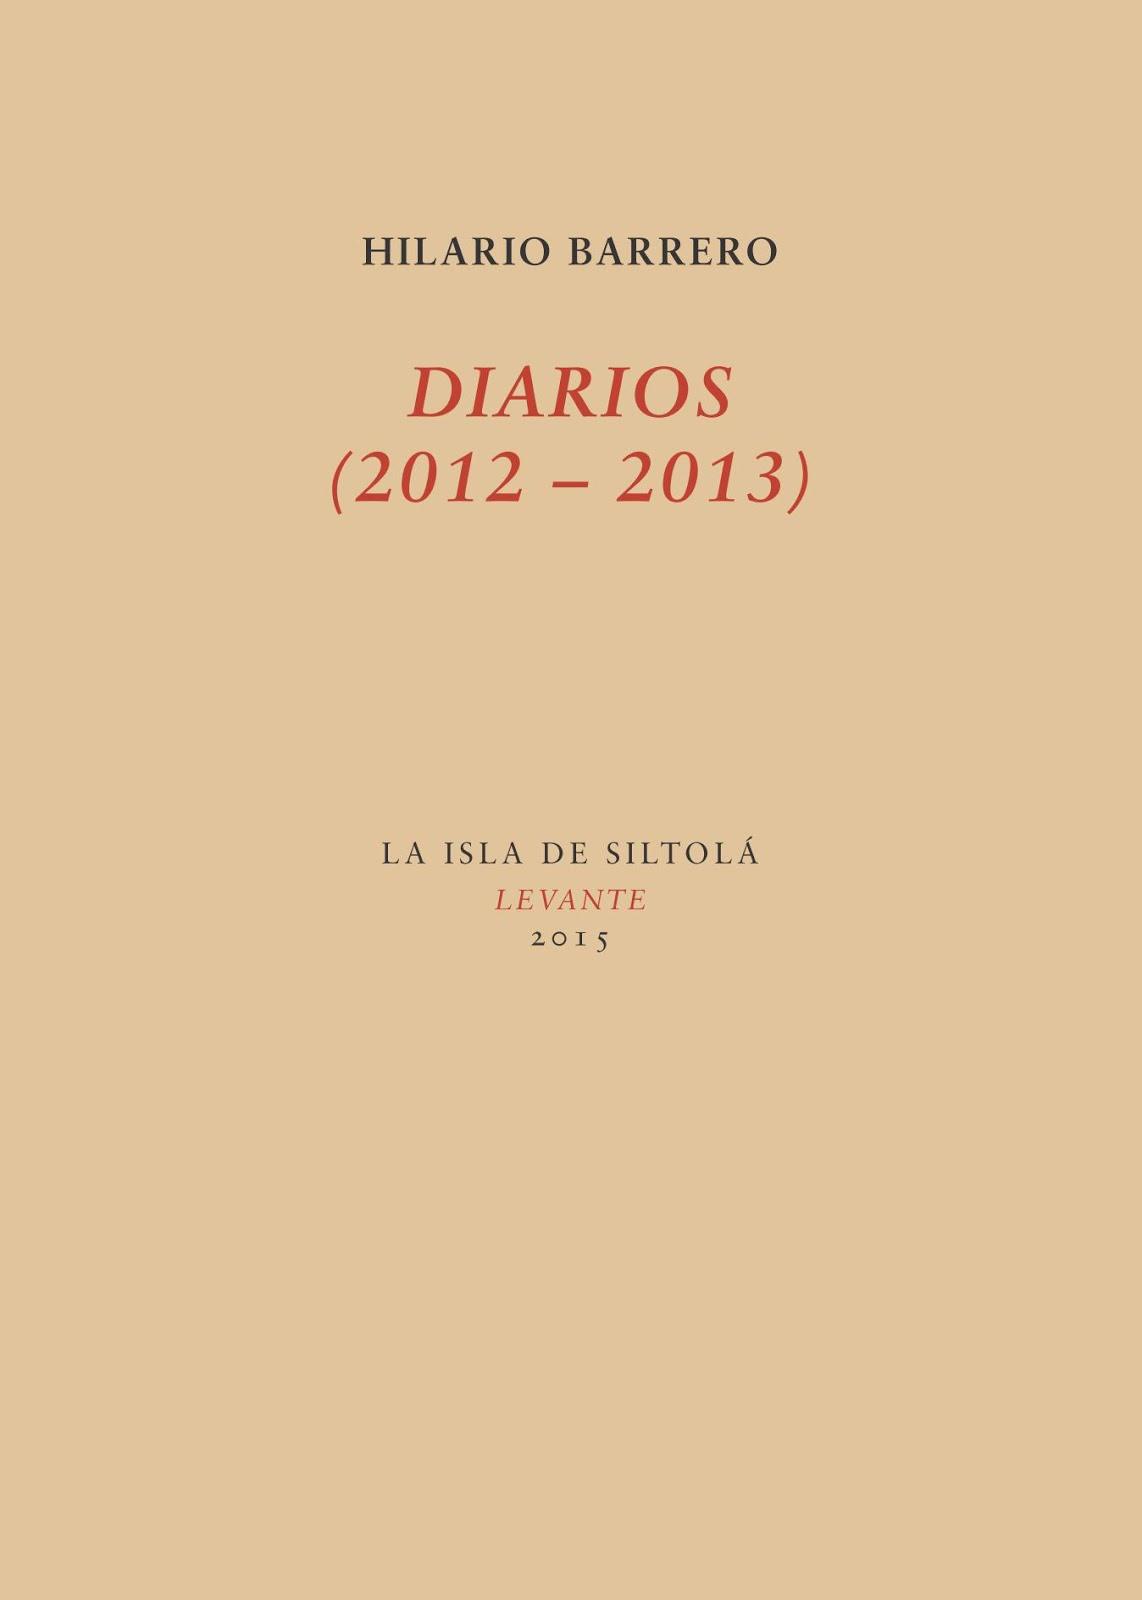 Image result for diarios 2012 2013 barrero